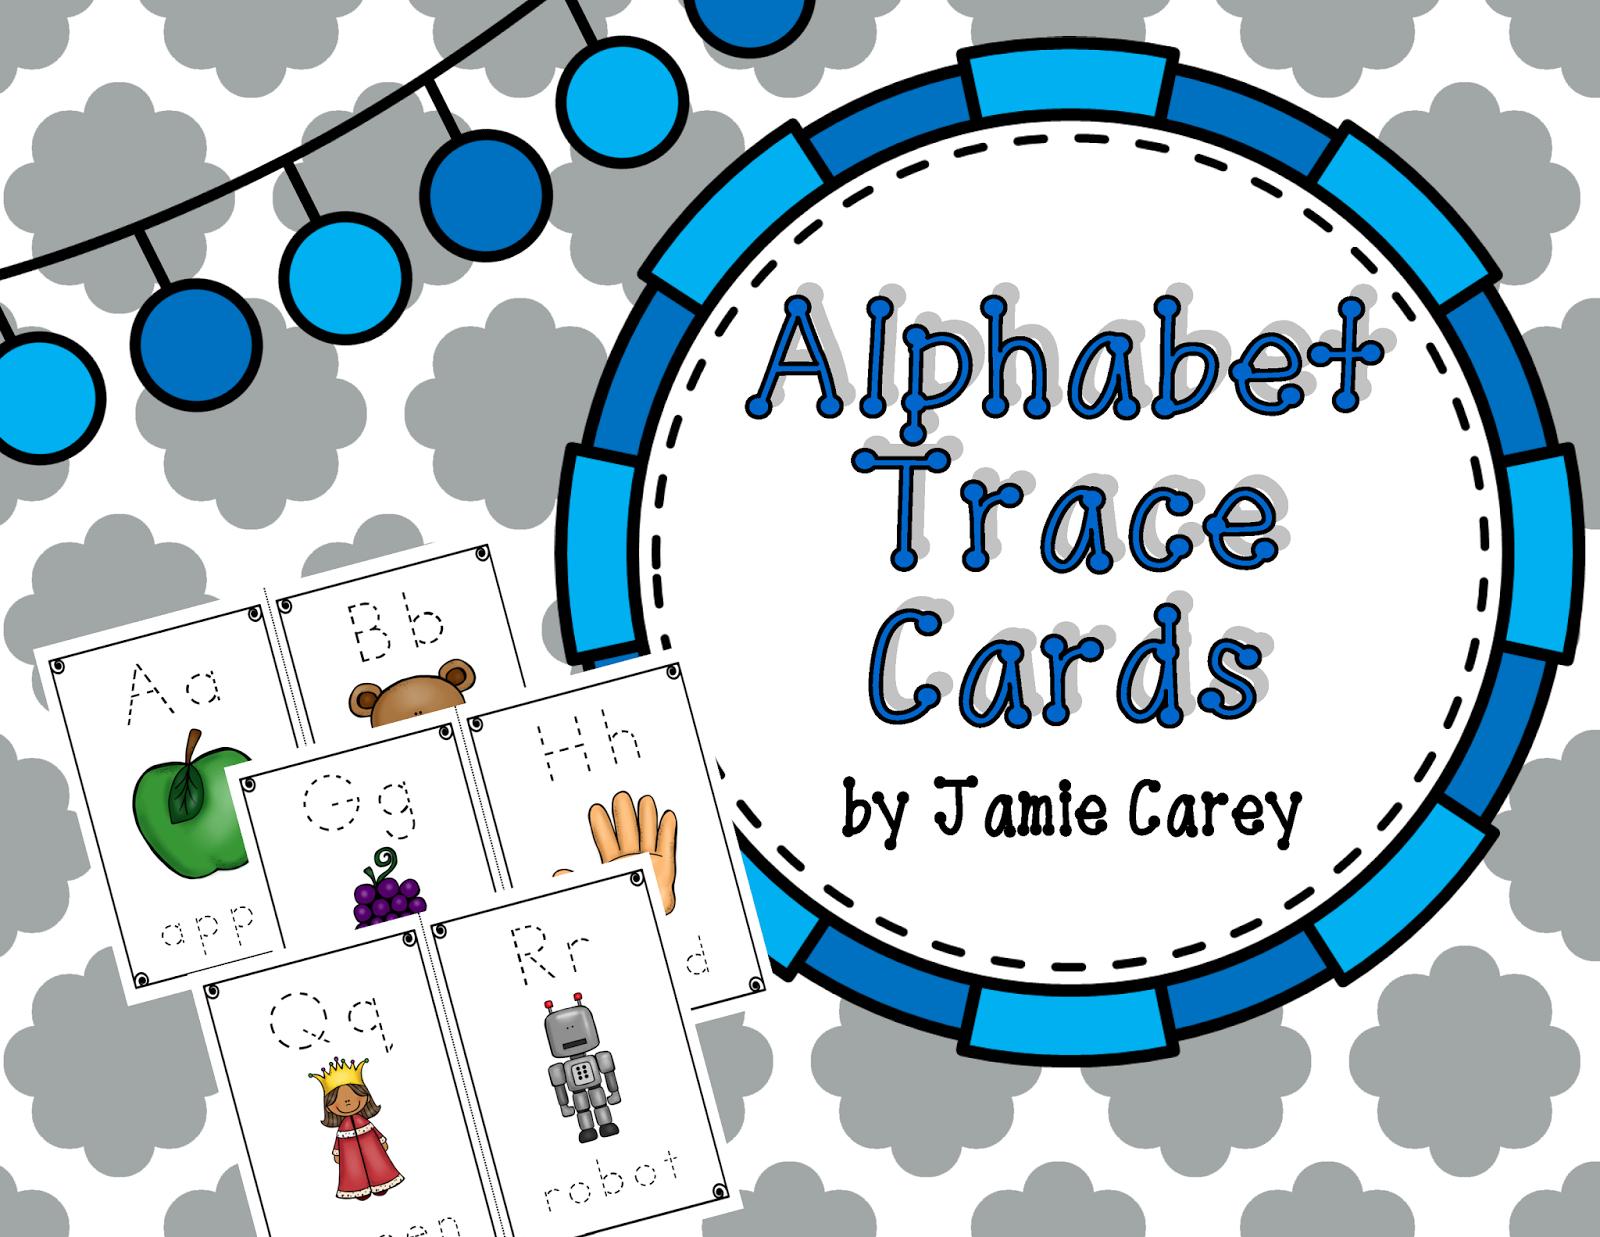 http://www.teacherspayteachers.com/Product/Alphabet-Trace-Cards-1371026